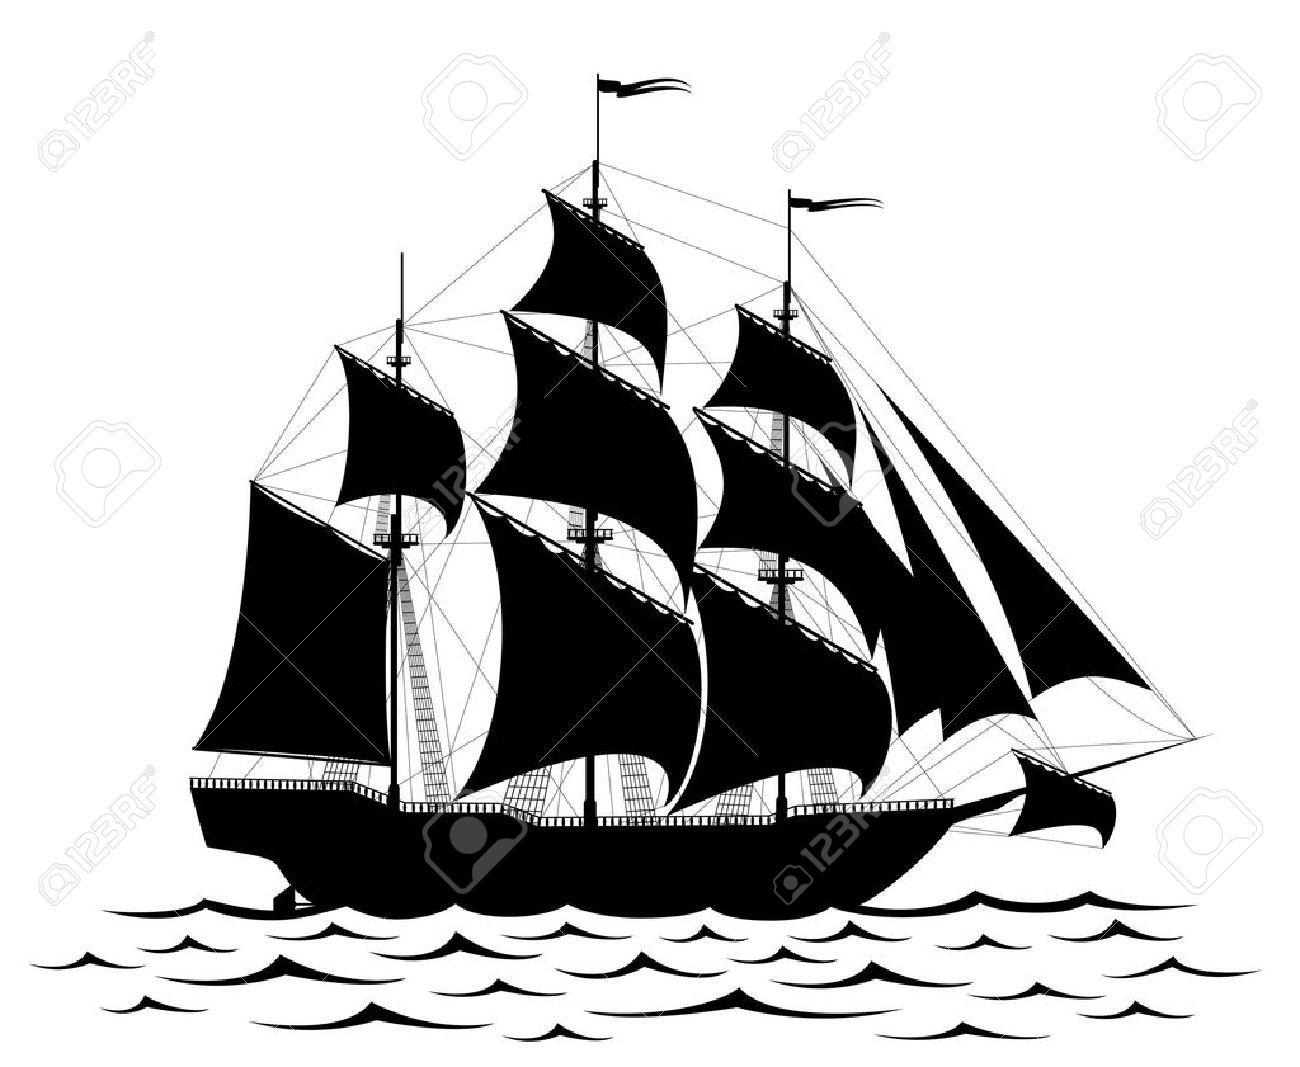 sailing ship silhouette Google Search Ship silhouette